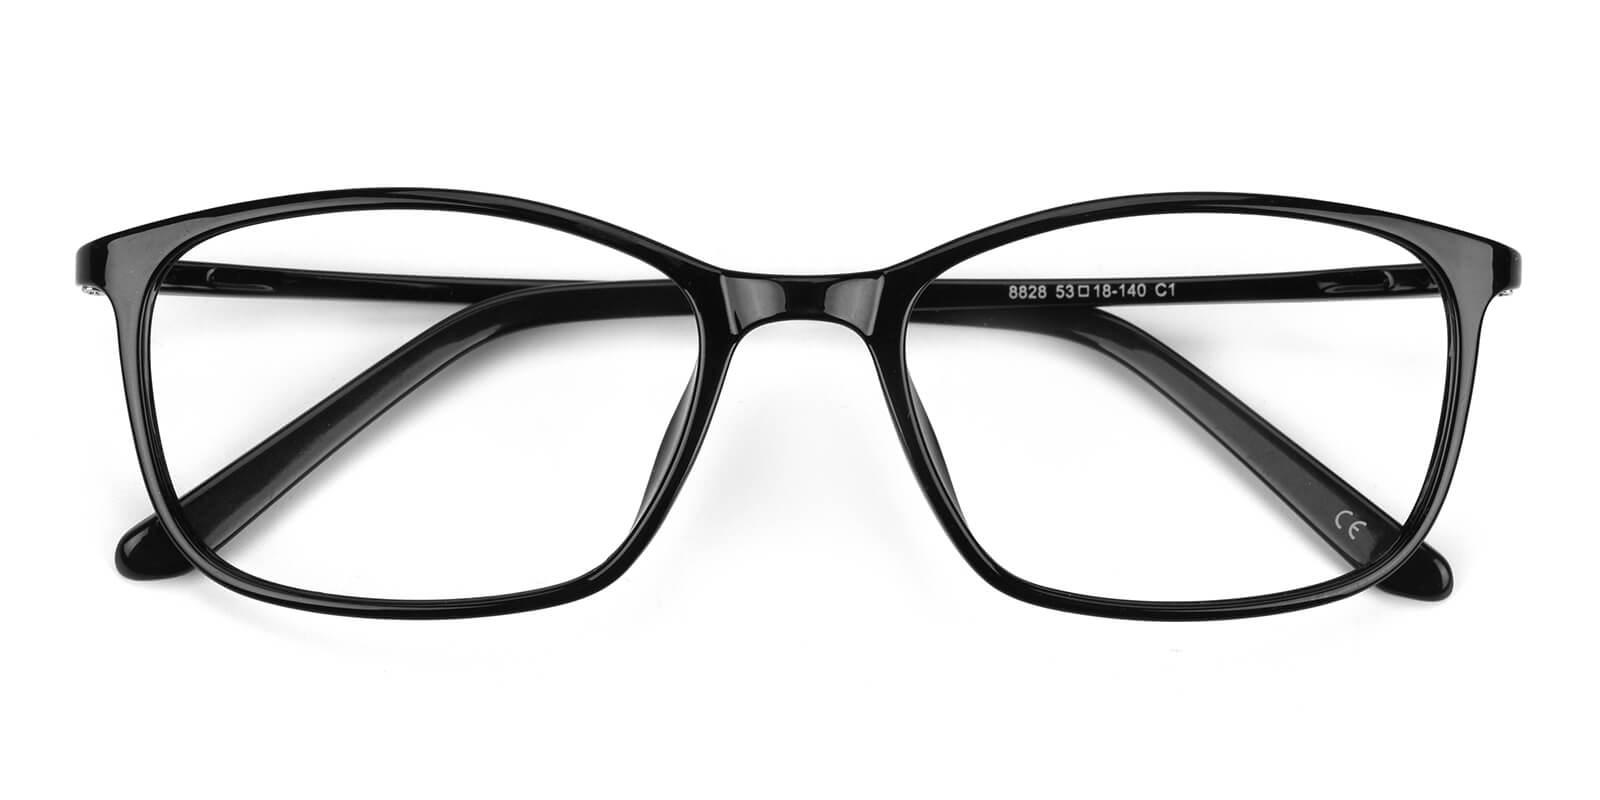 Jerry-Black-Square-TR-Eyeglasses-detail